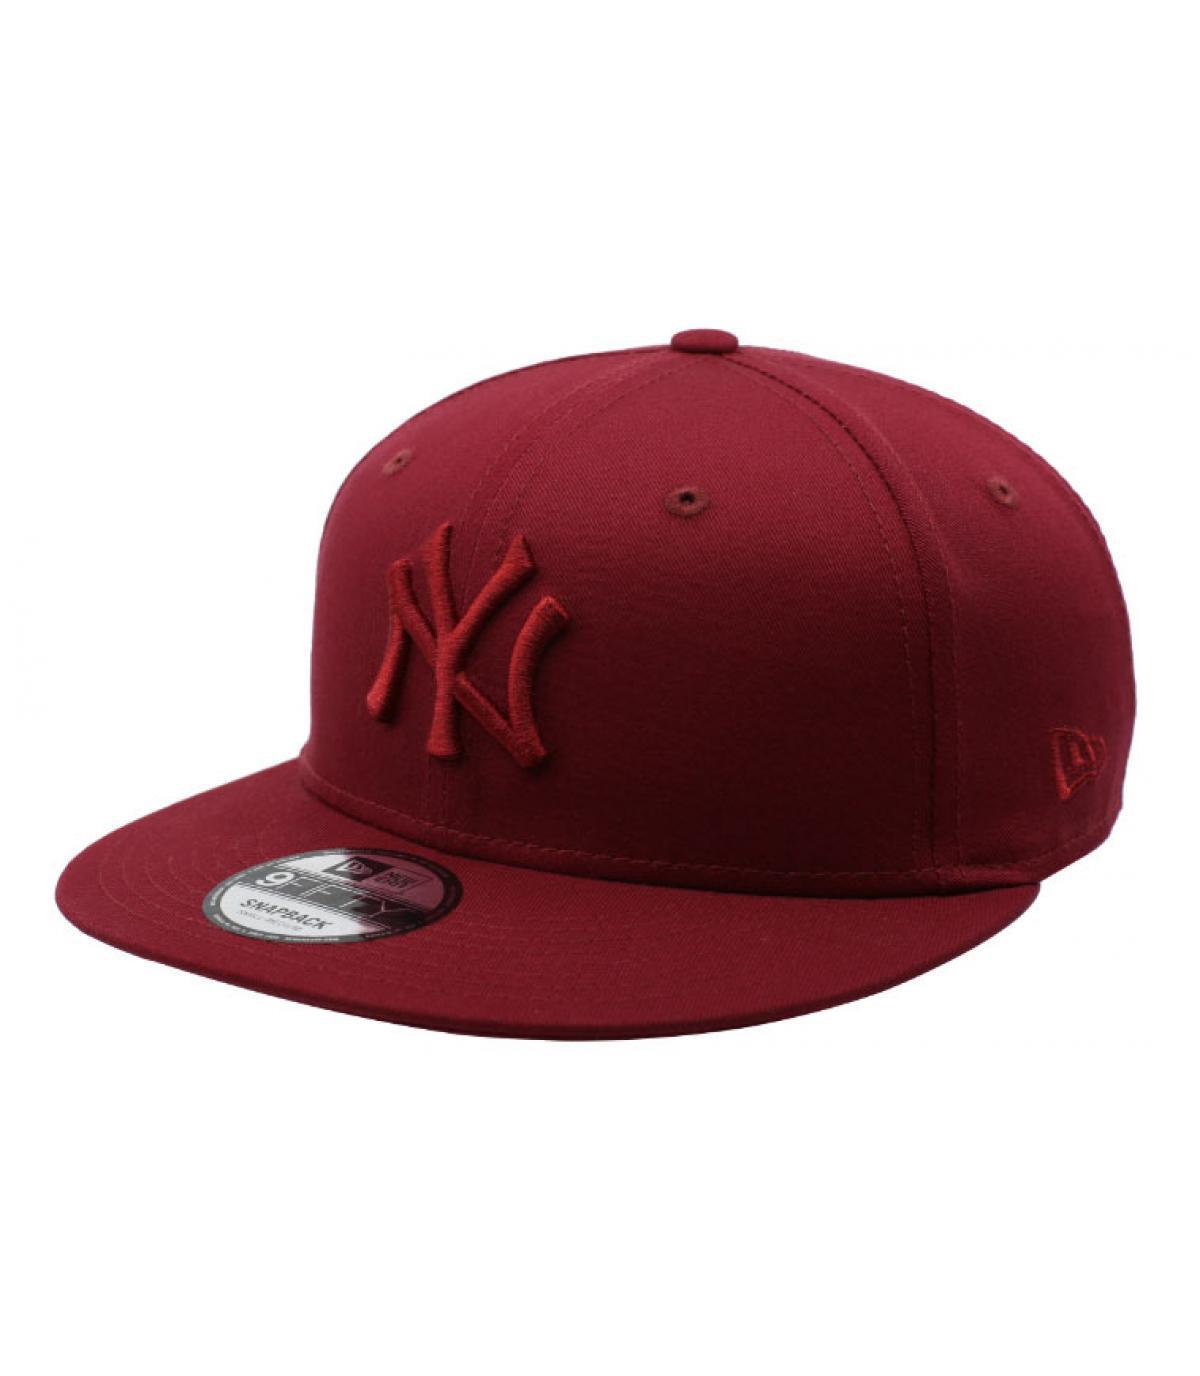 Details Snapback League Ess 9Fifty NY cardinal - Abbildung 2